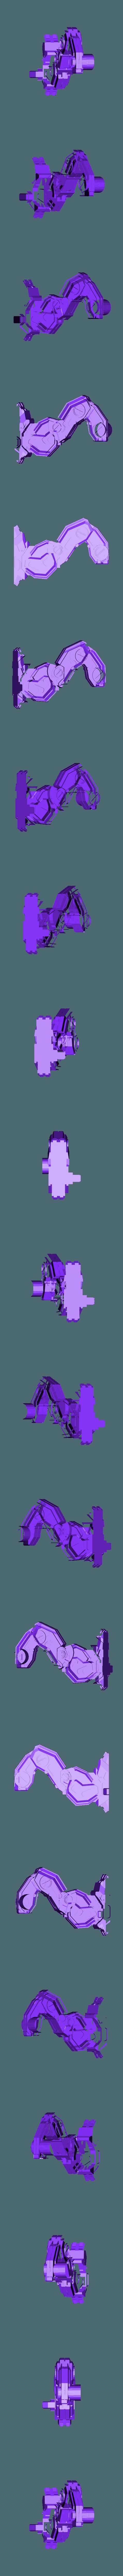 Left_Leg.stl Download free STL file Modular Linebacker Mech • 3D printing object, mrhers2